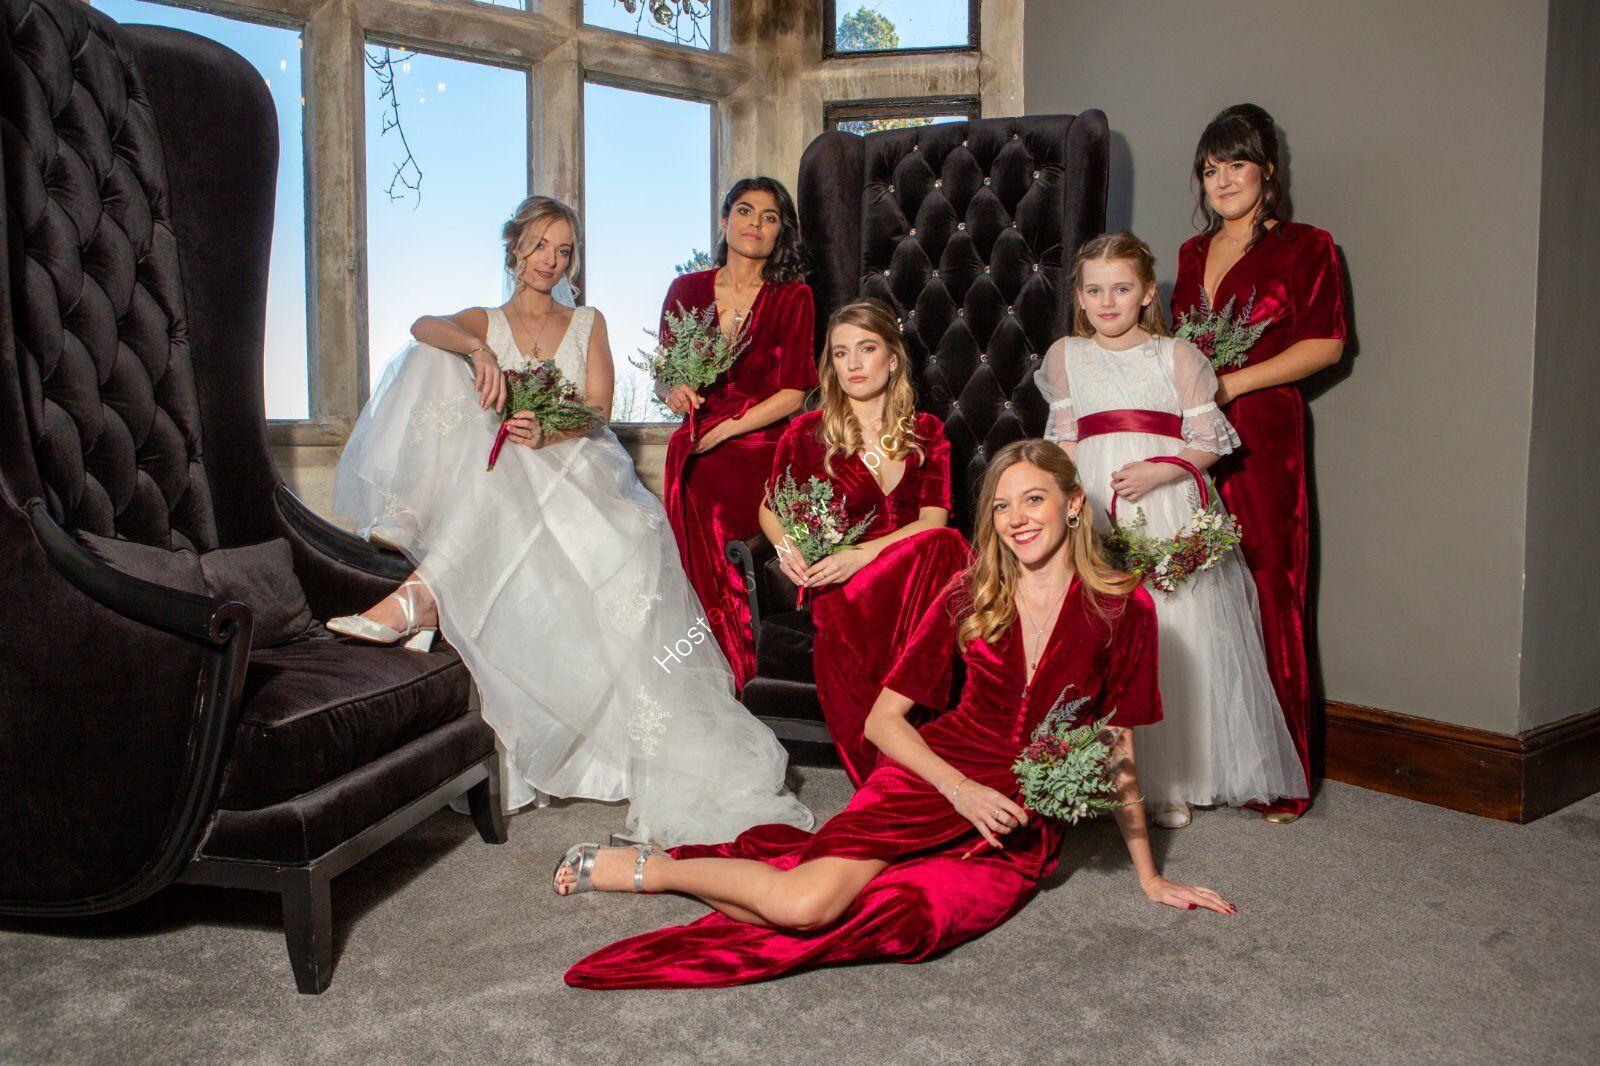 Bride's Angels